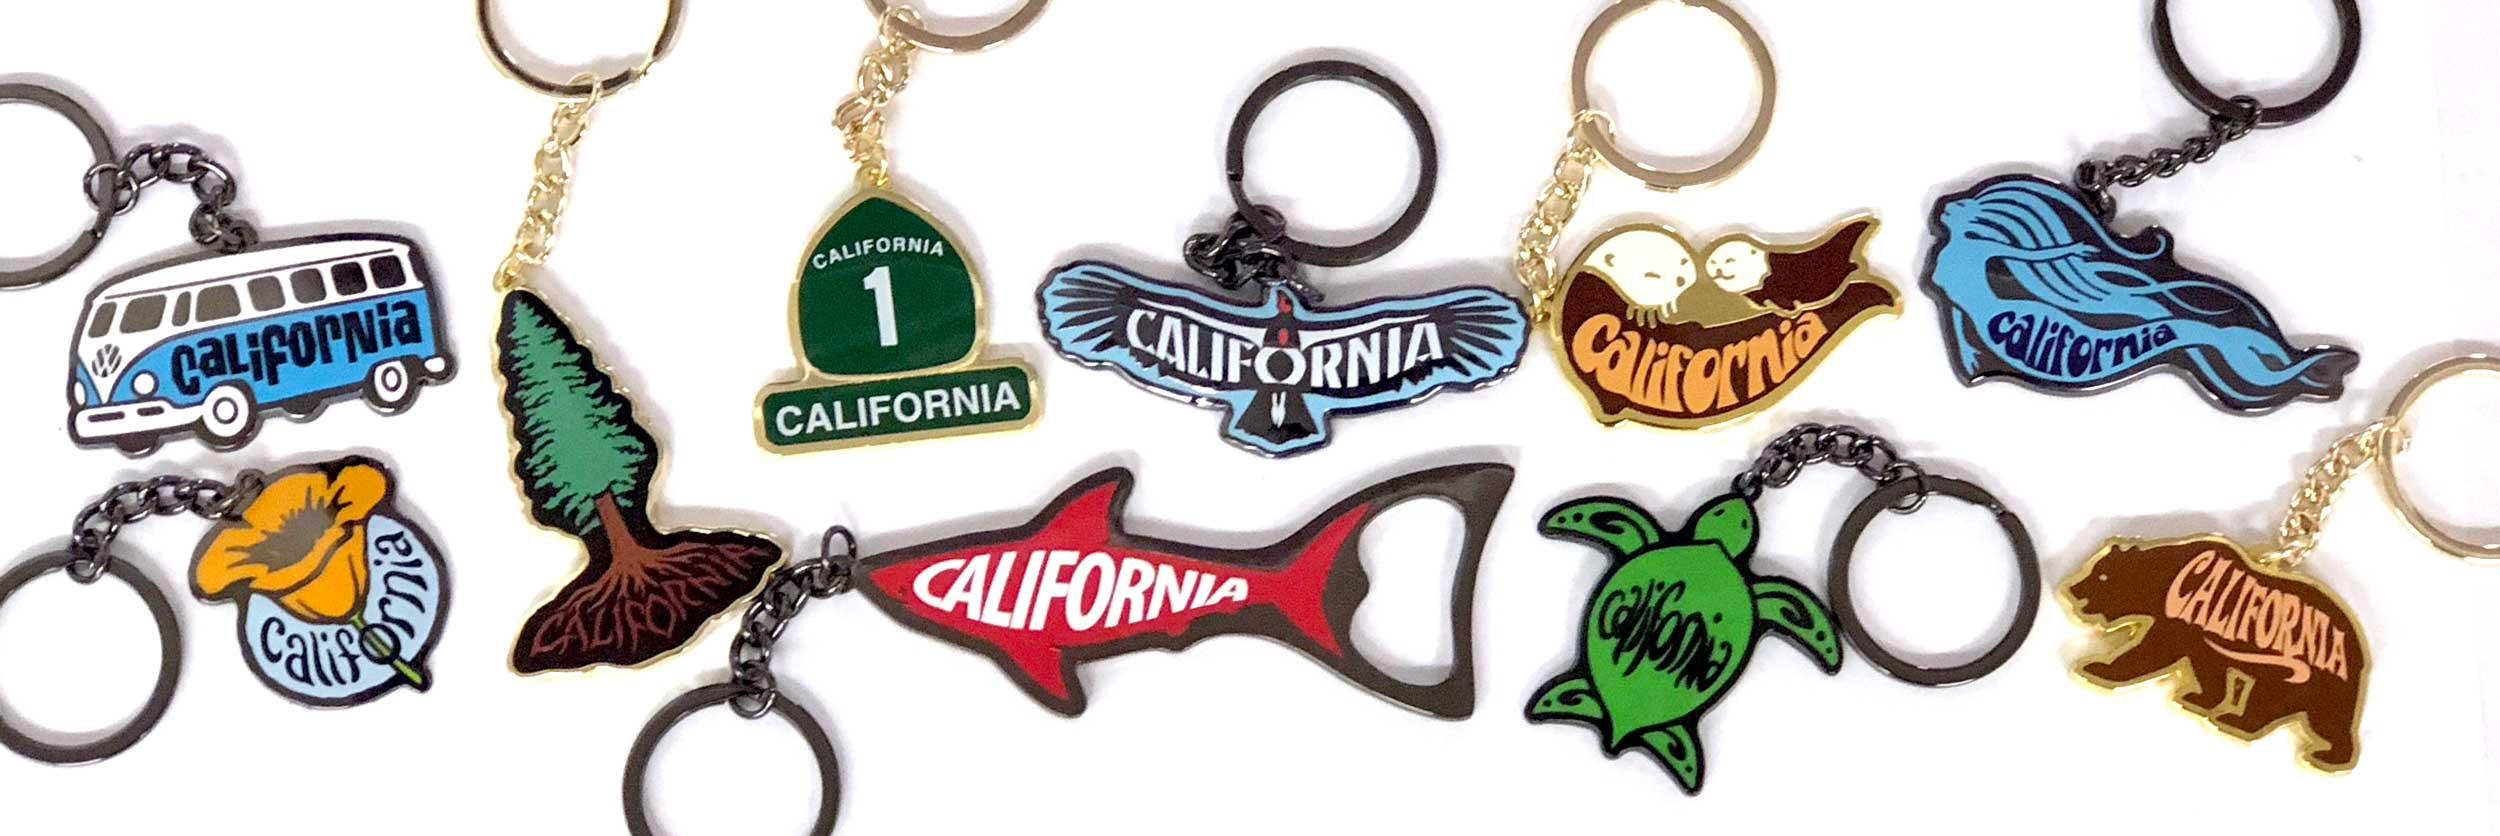 banner-keychains-cropped.jpg